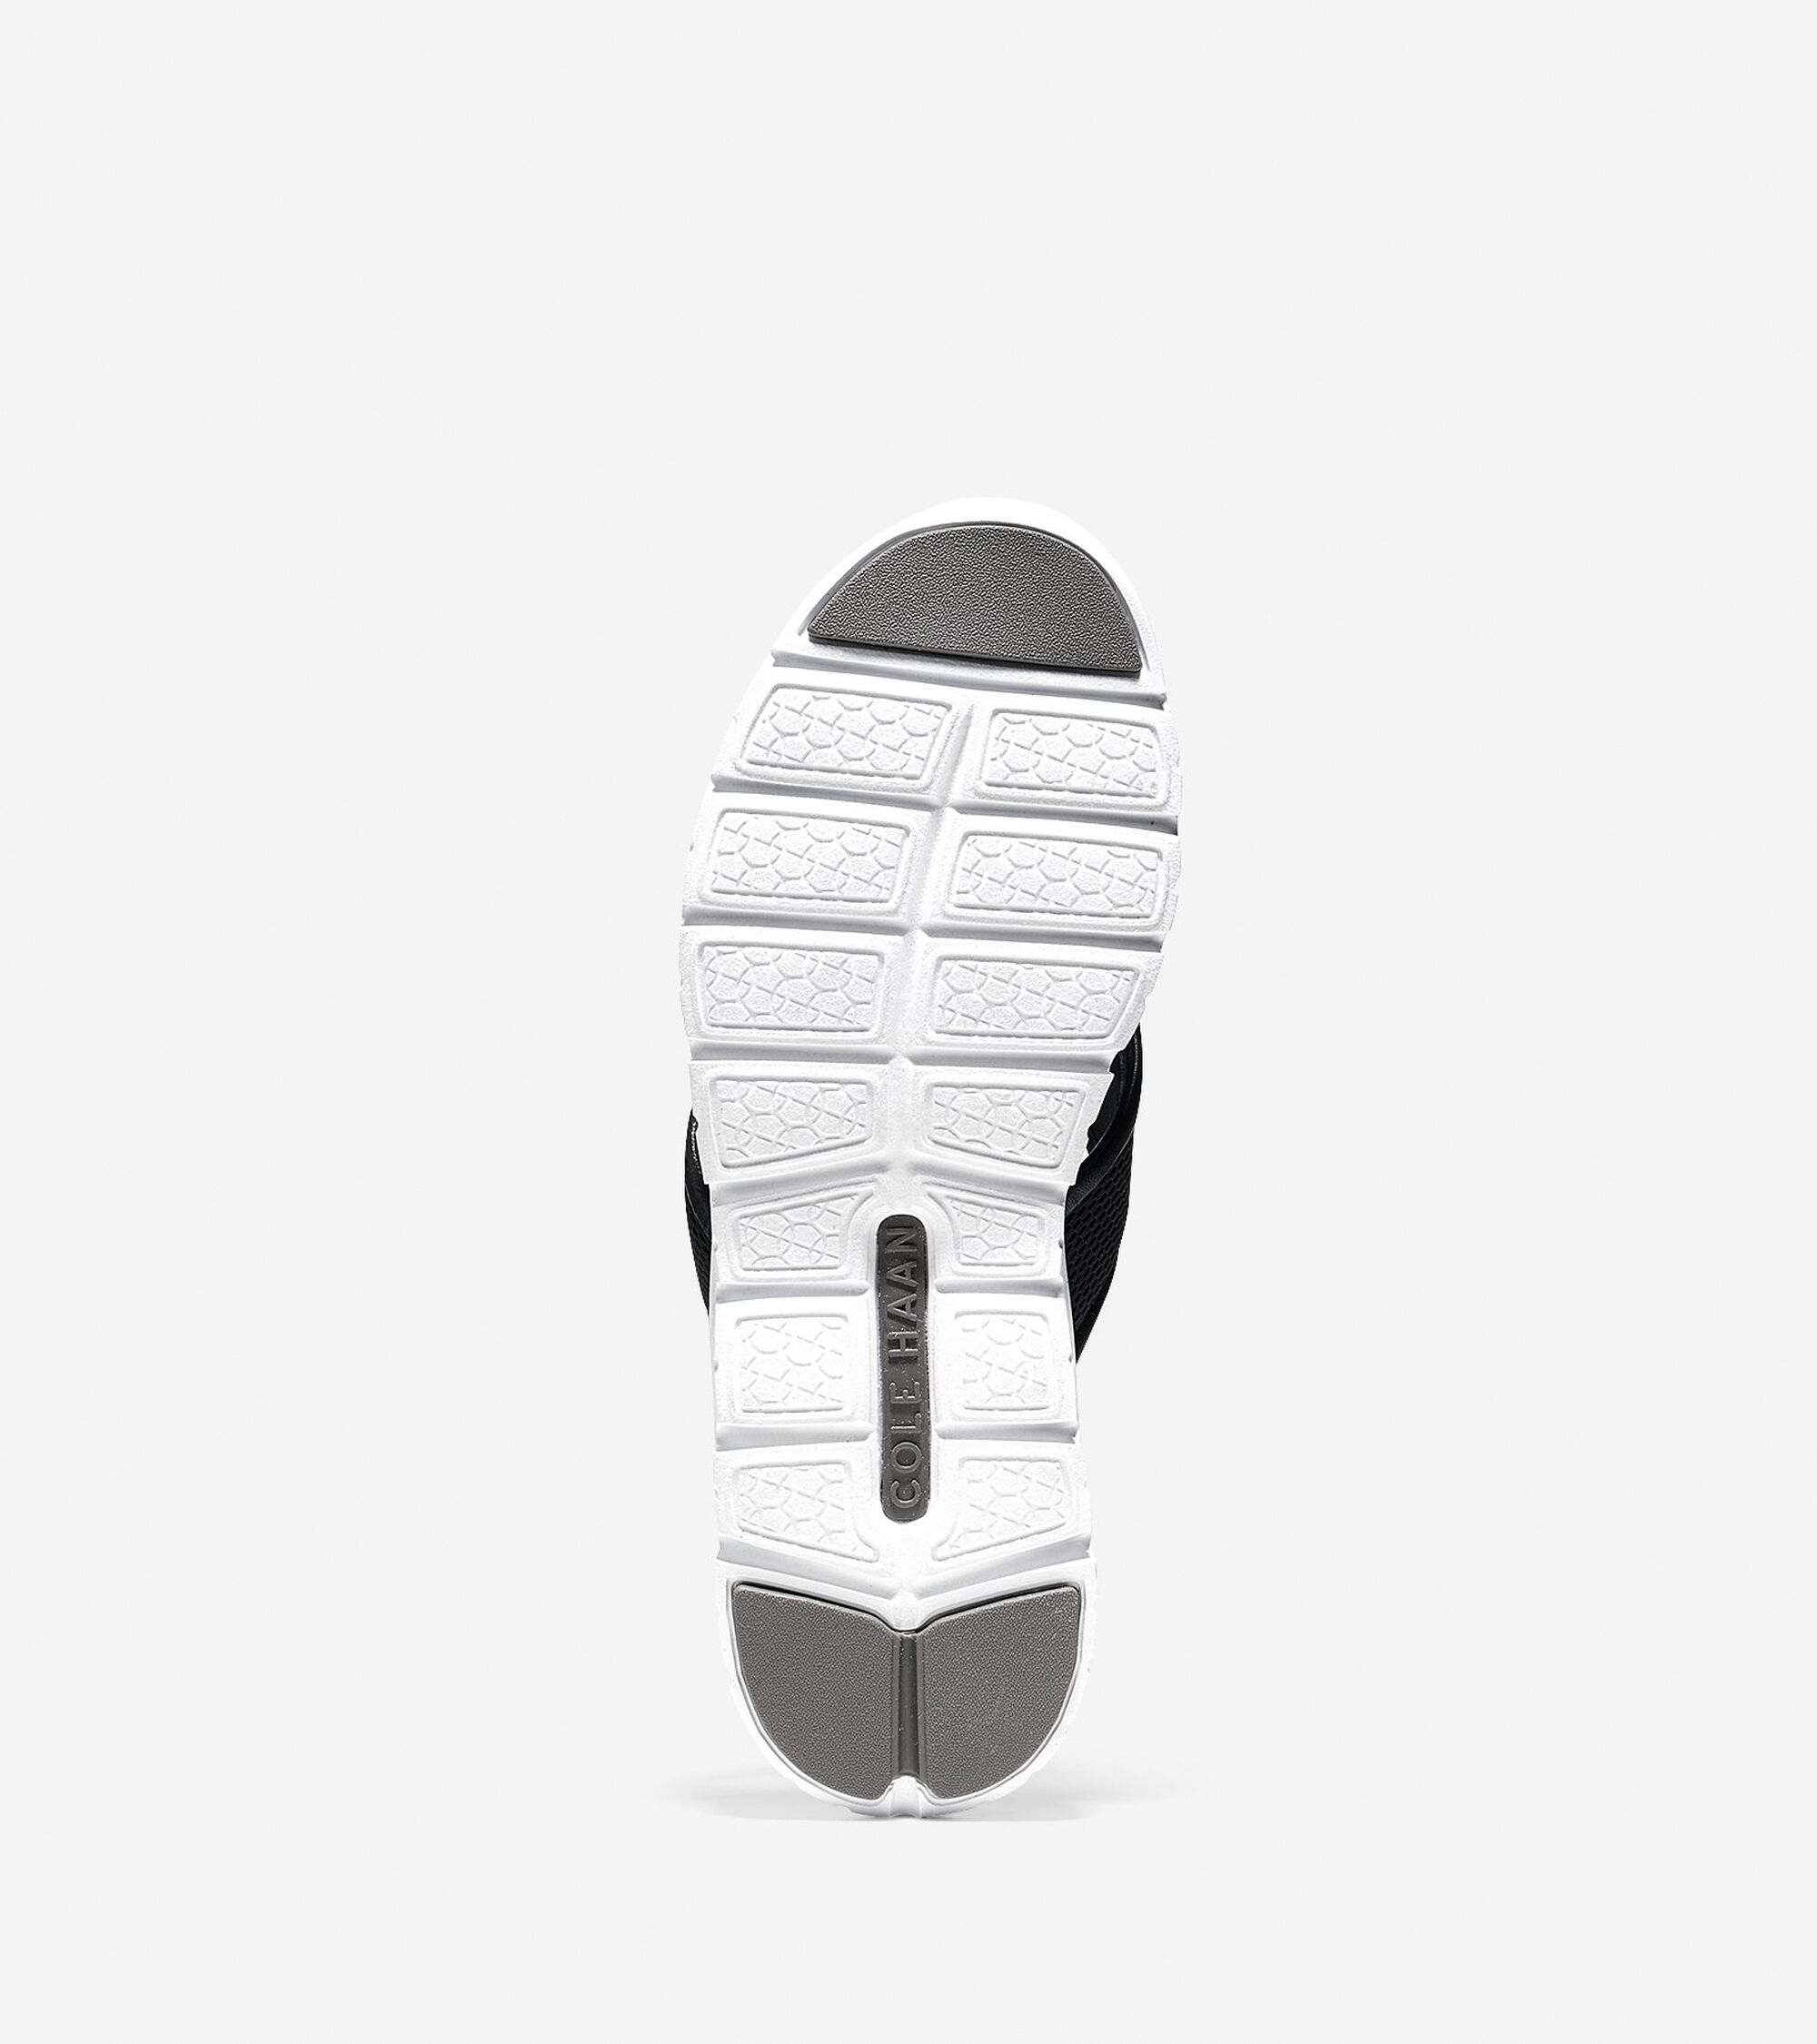 3c755b641065 Womens ZEROGRAND Thong Sandals in Black